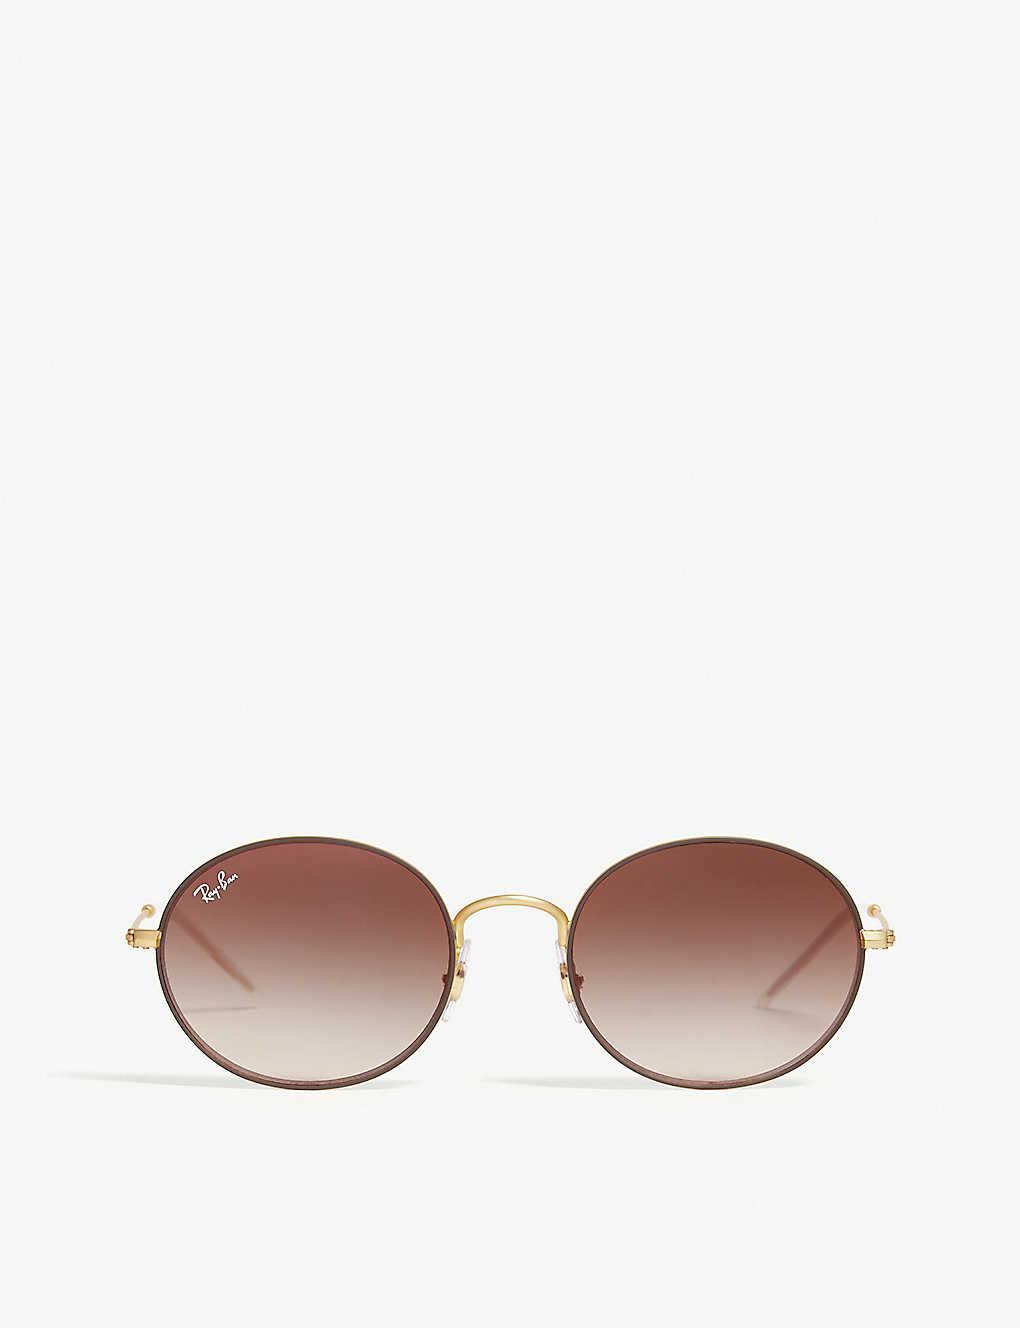 5f0fb8ebda RAY-BAN - RB3594 round-frame sunglasses